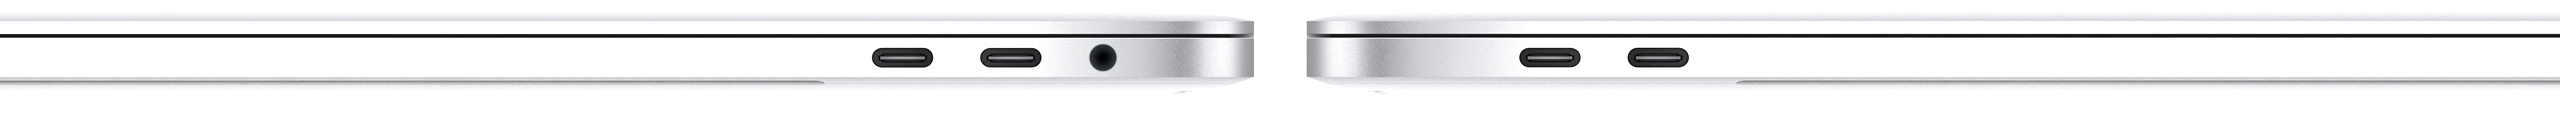 "Apple MacBook Pro Retina Touch Bar 15"" 512Gb Silver (MPTV2) 2017"